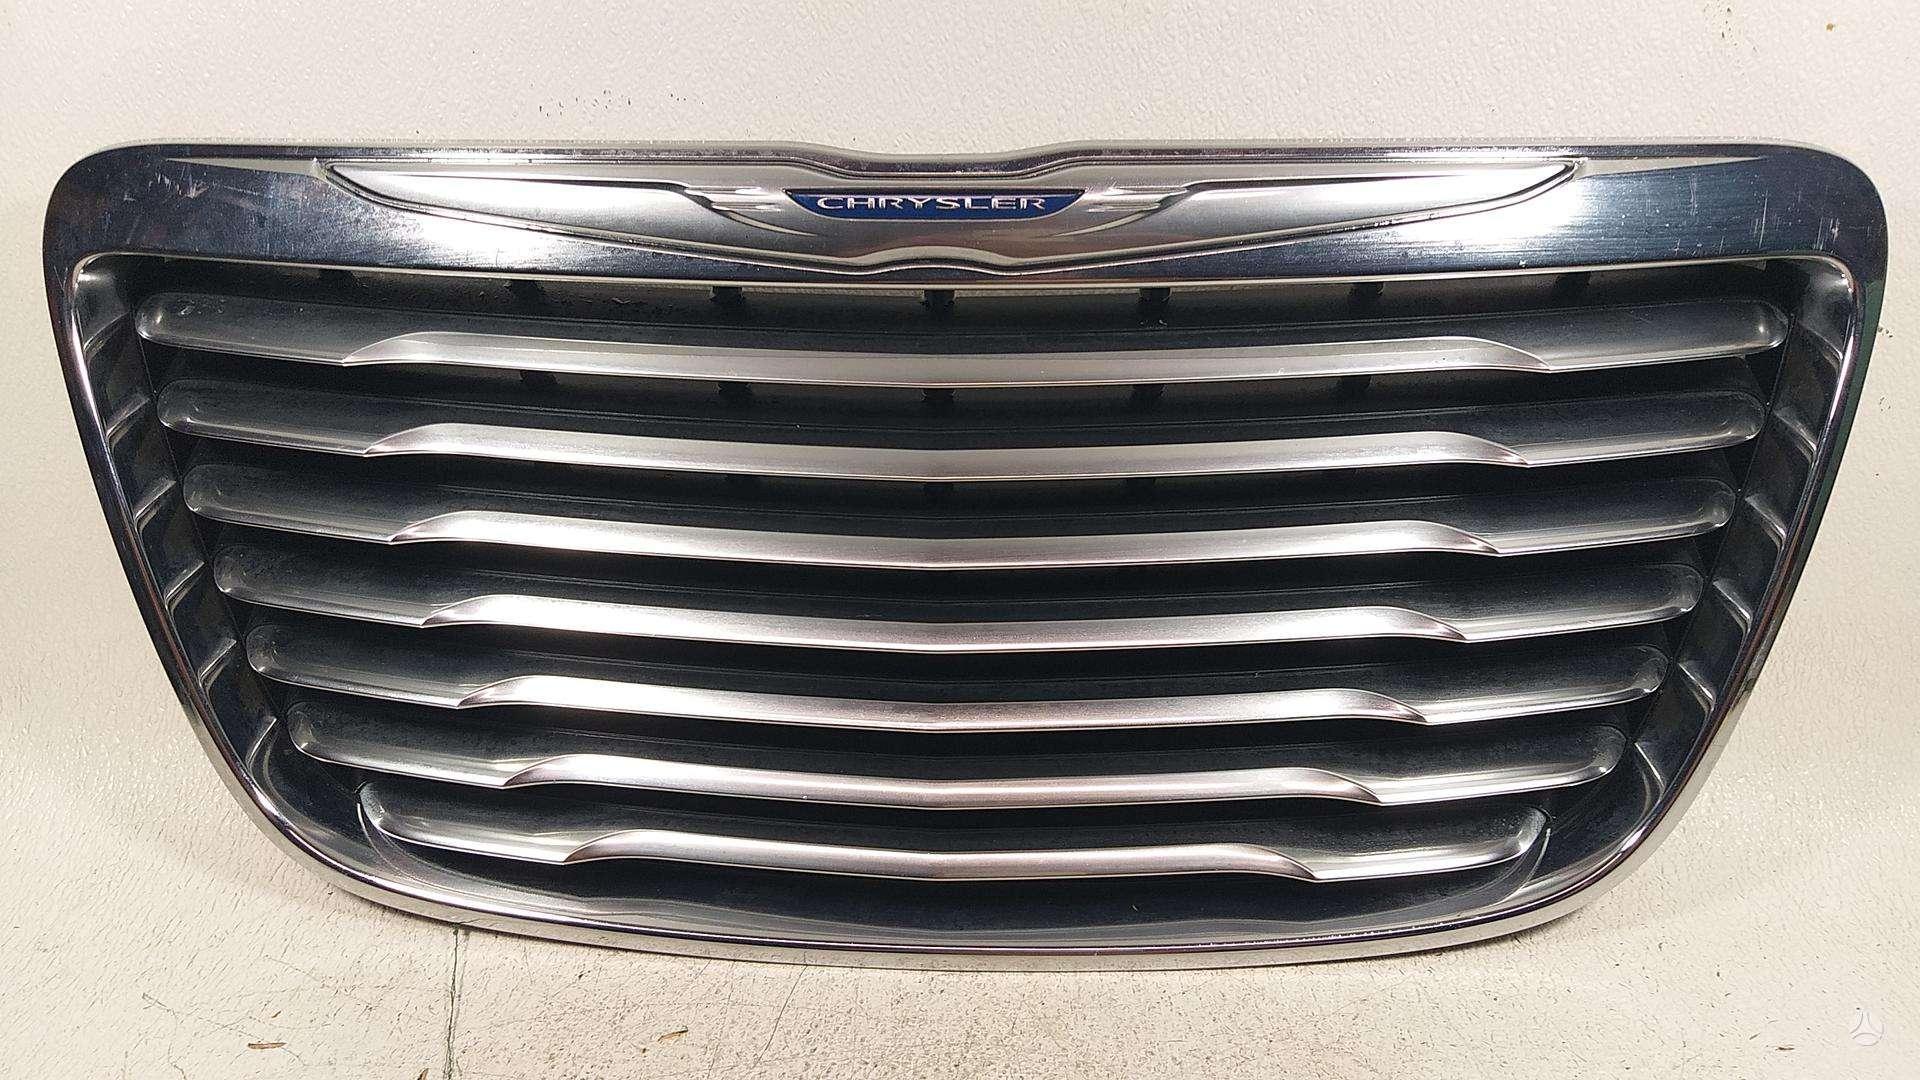 Chrysler 300 Series 3.5 3.5L 2006-2007 2006 2.7 2.7L DB Electrical SMT0299 Starter